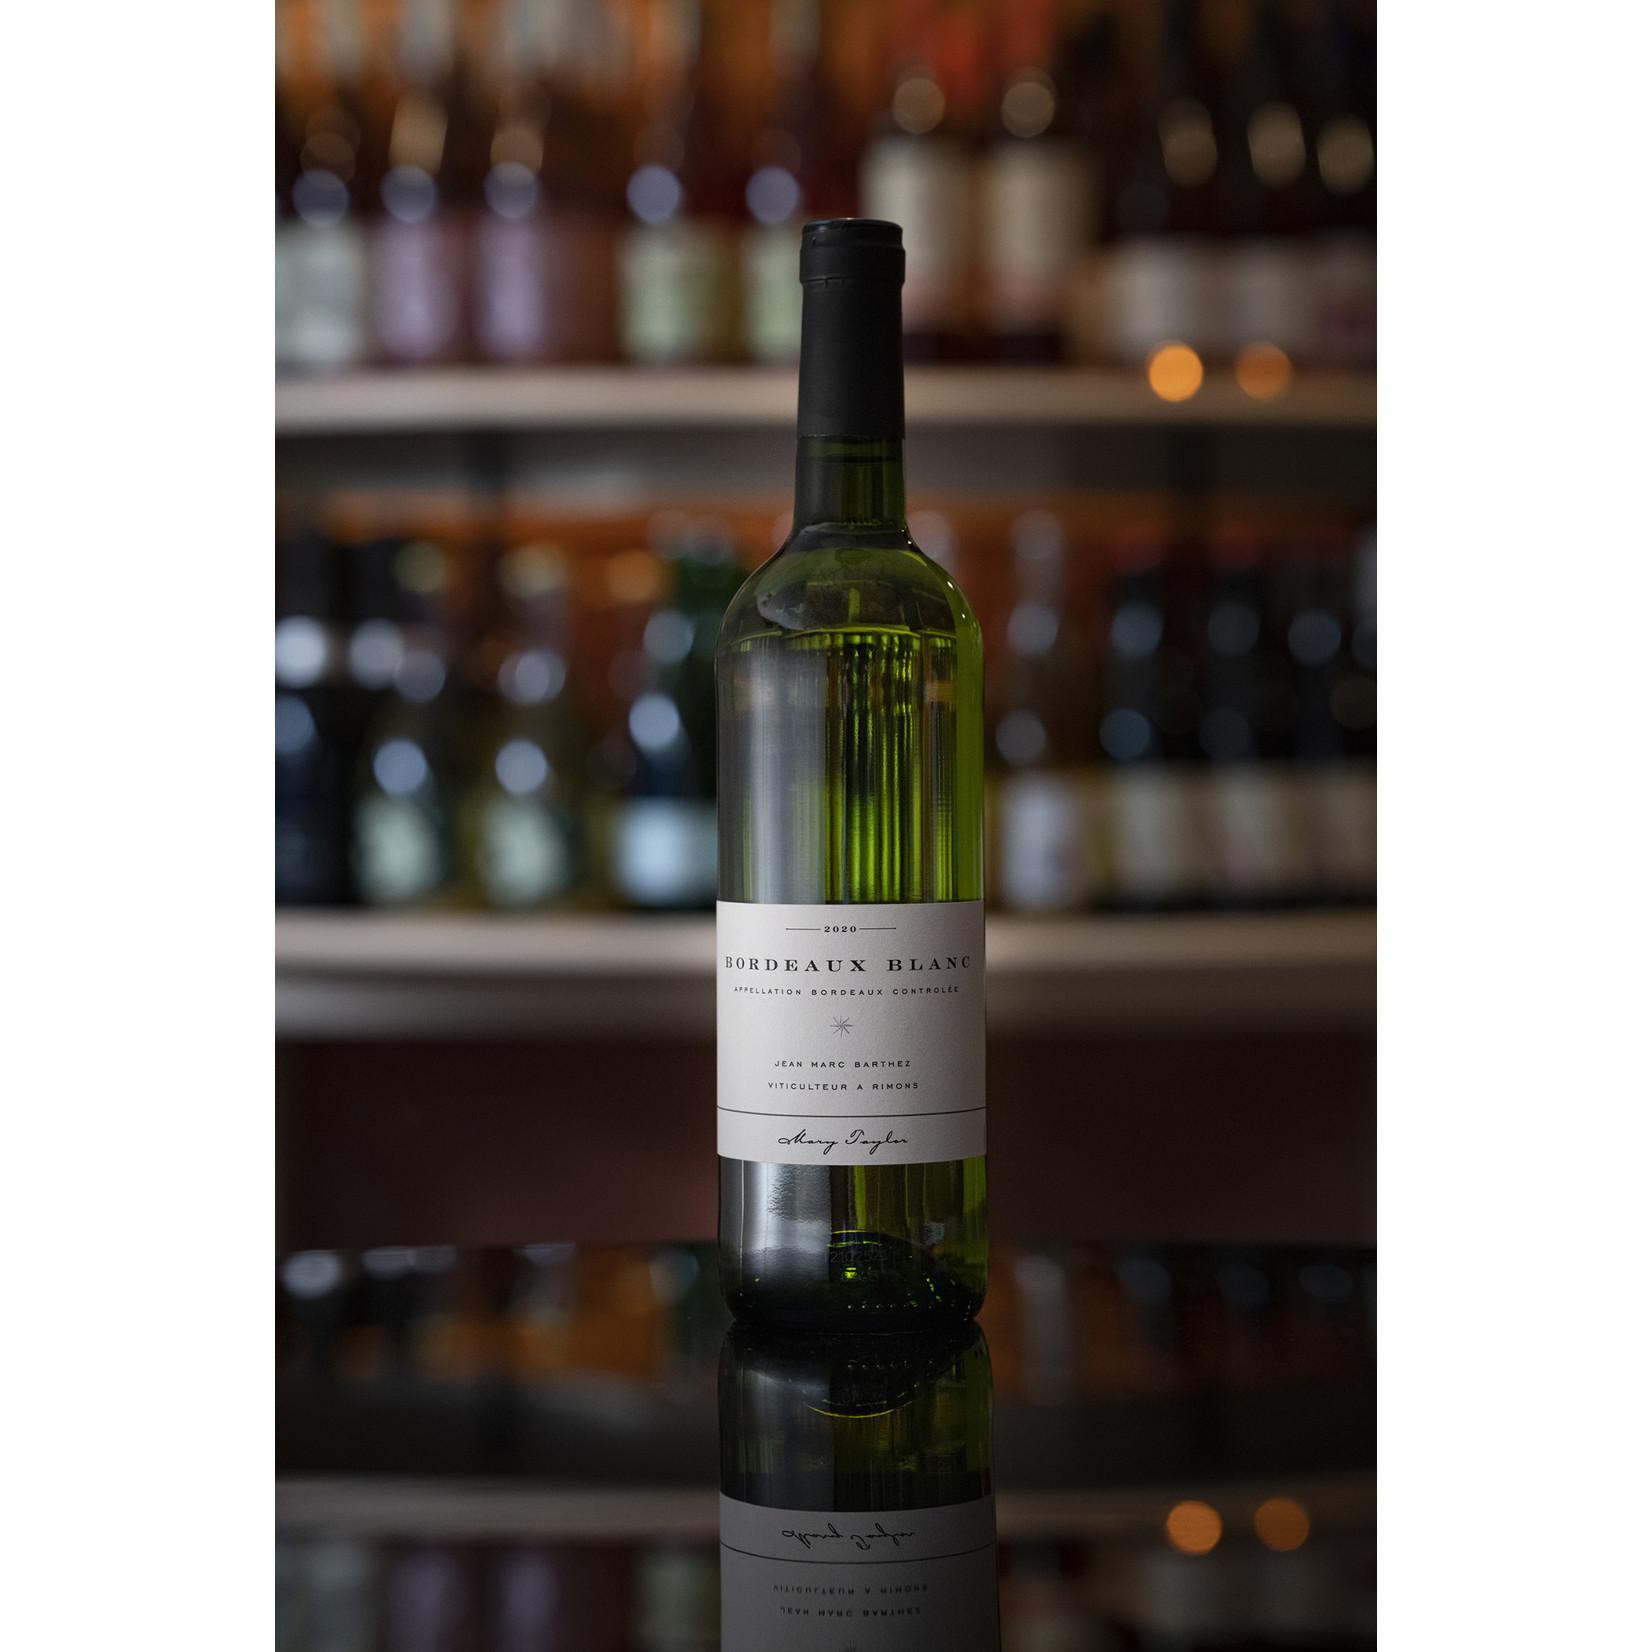 2020 Sauvignon Blanc, Jean Marc Barthez Bordeaux Blanc